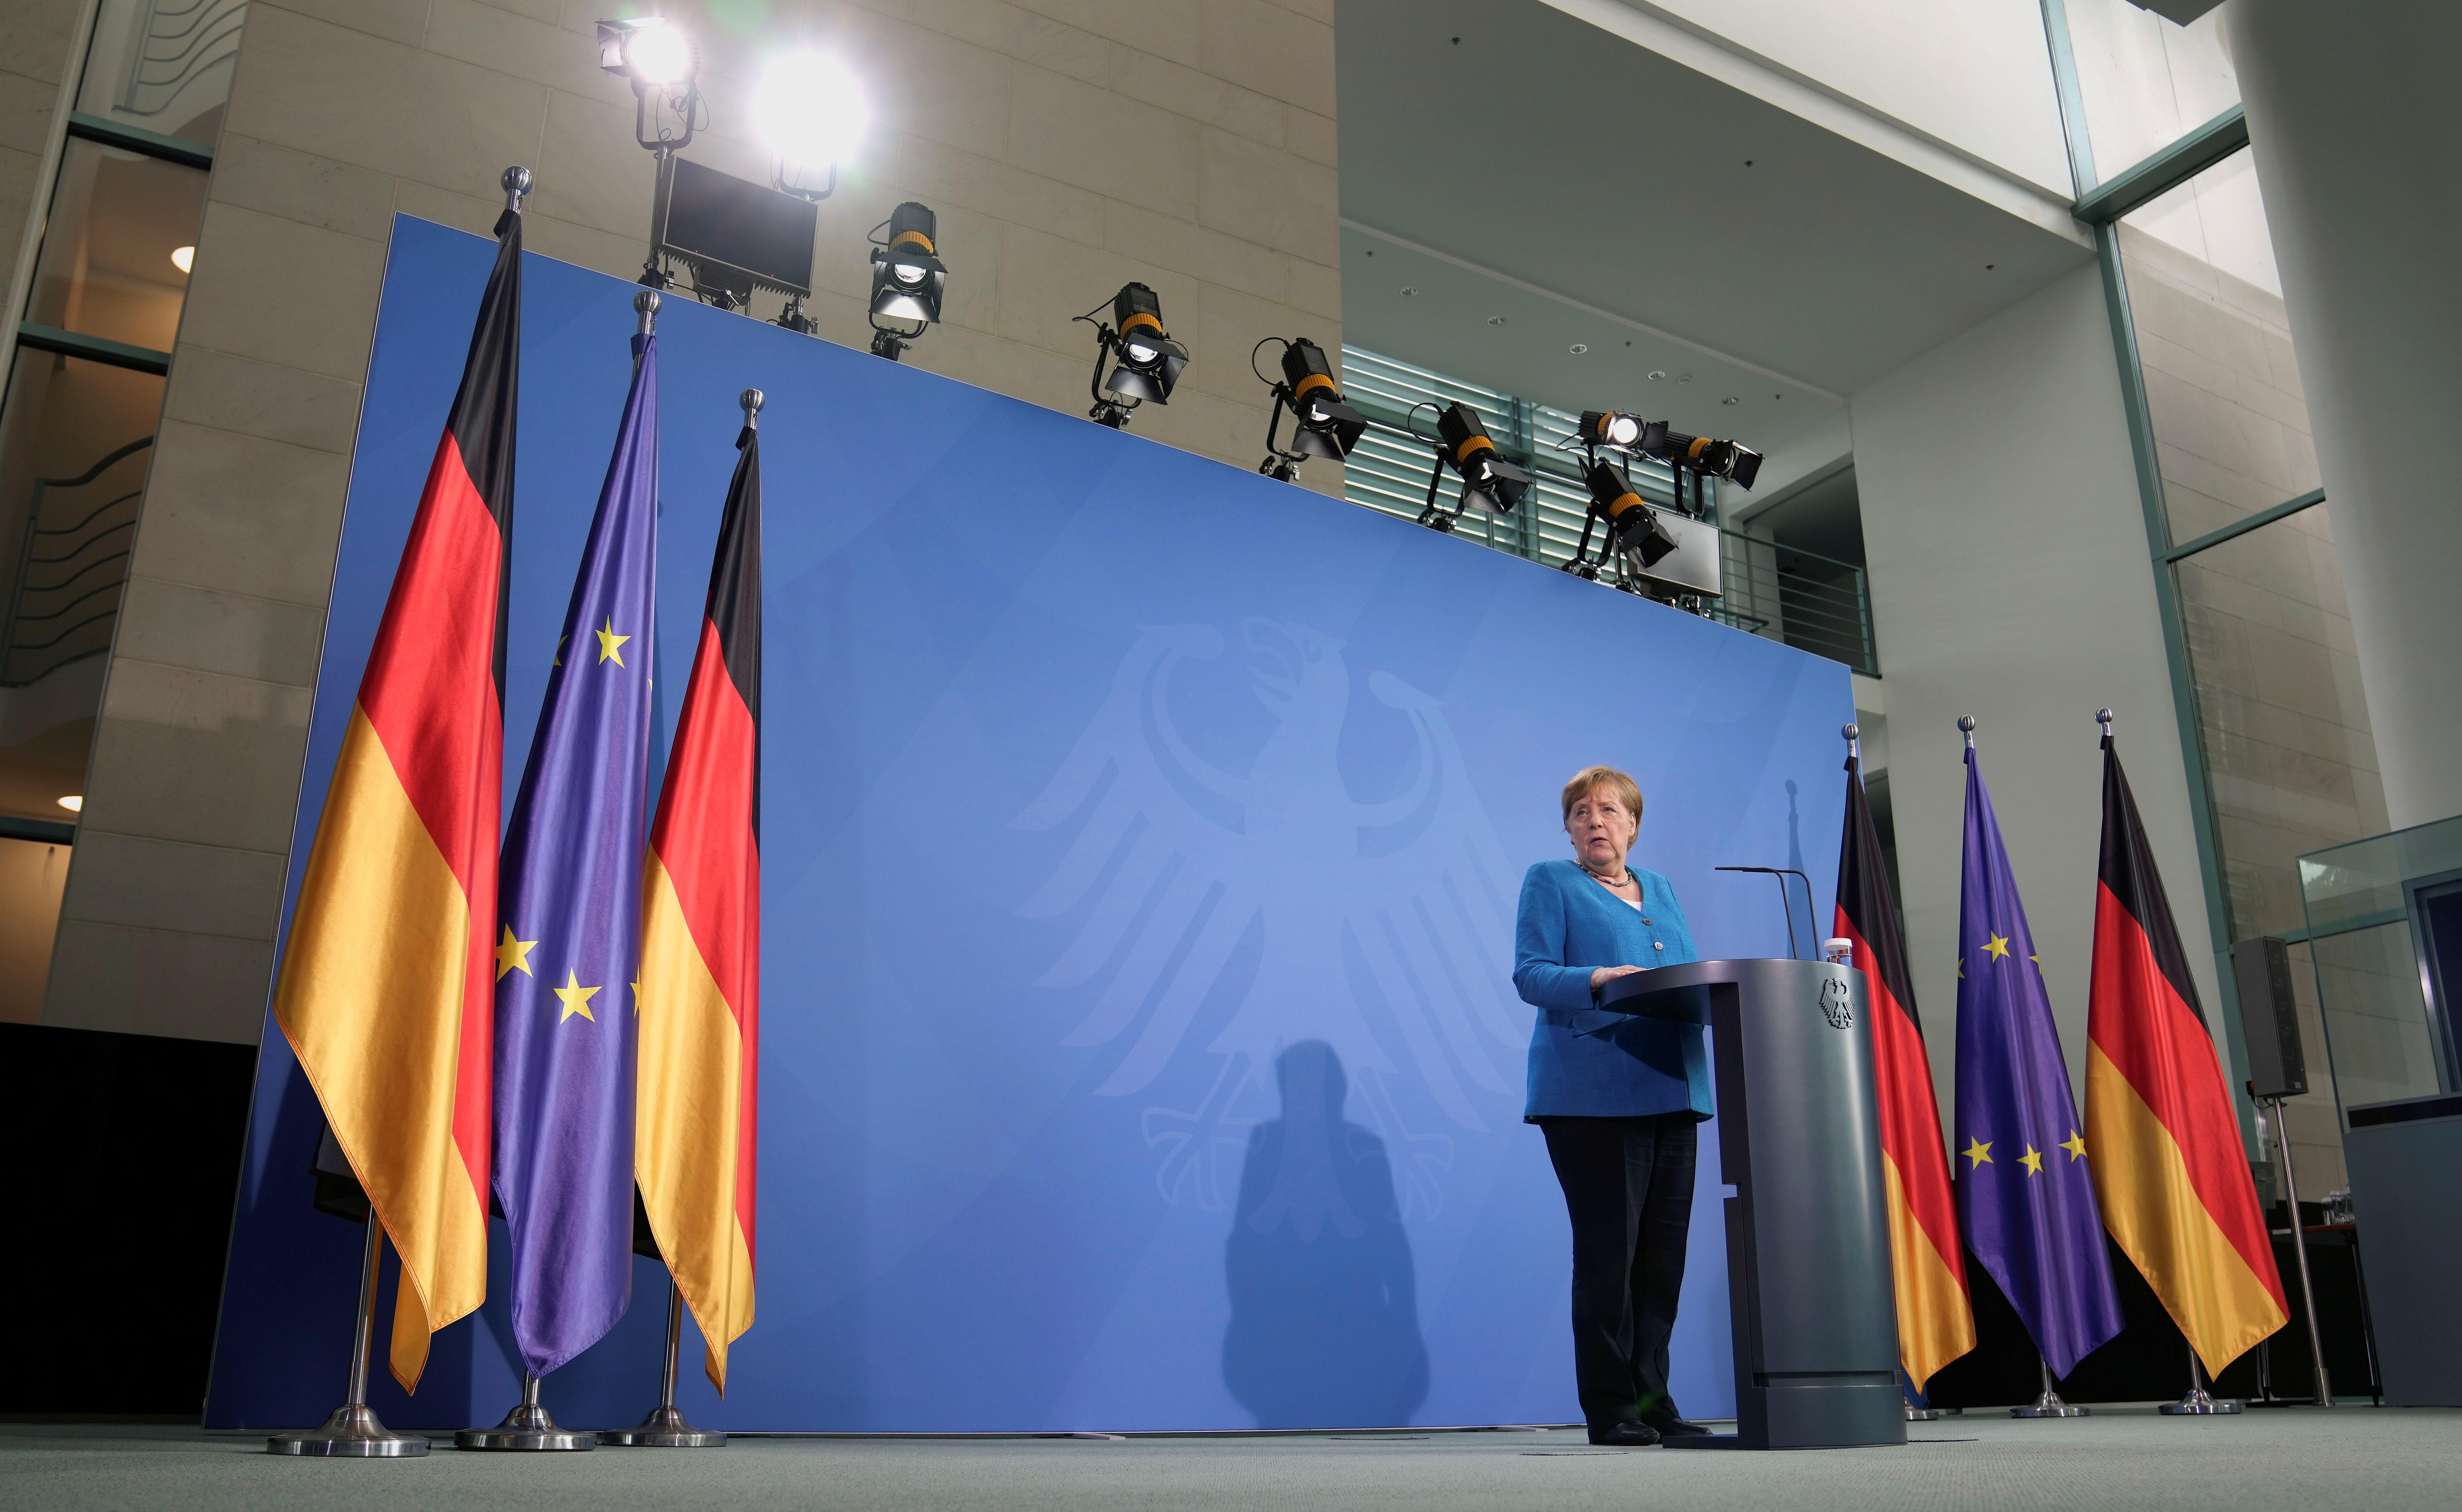 German Chancellor Angela Merkel addresses the media after a virtual